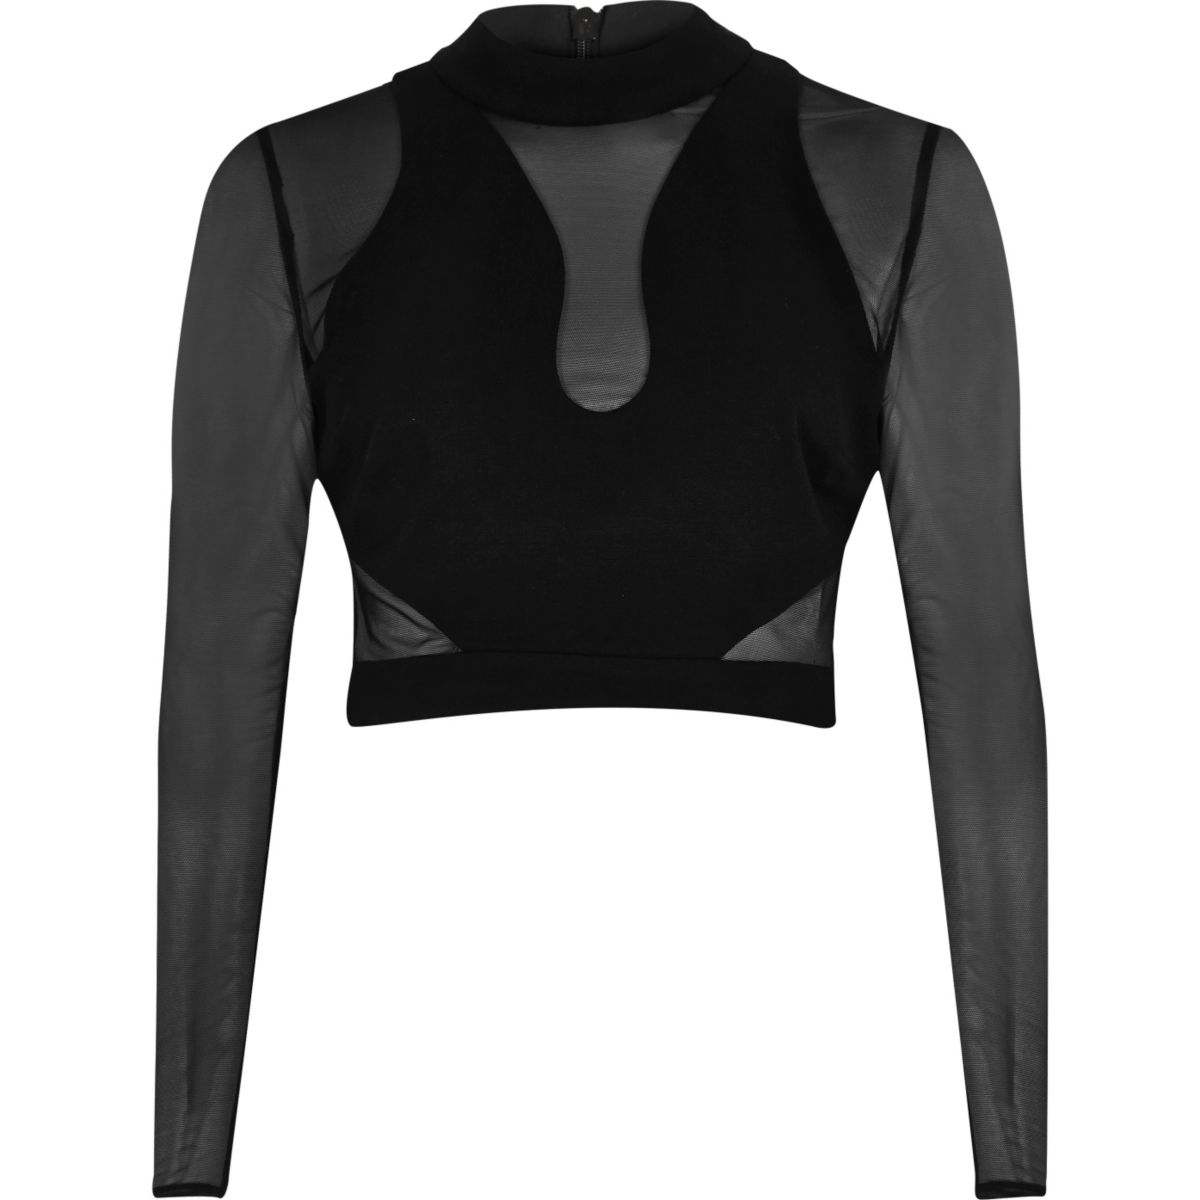 Black mesh turtle neck crop top